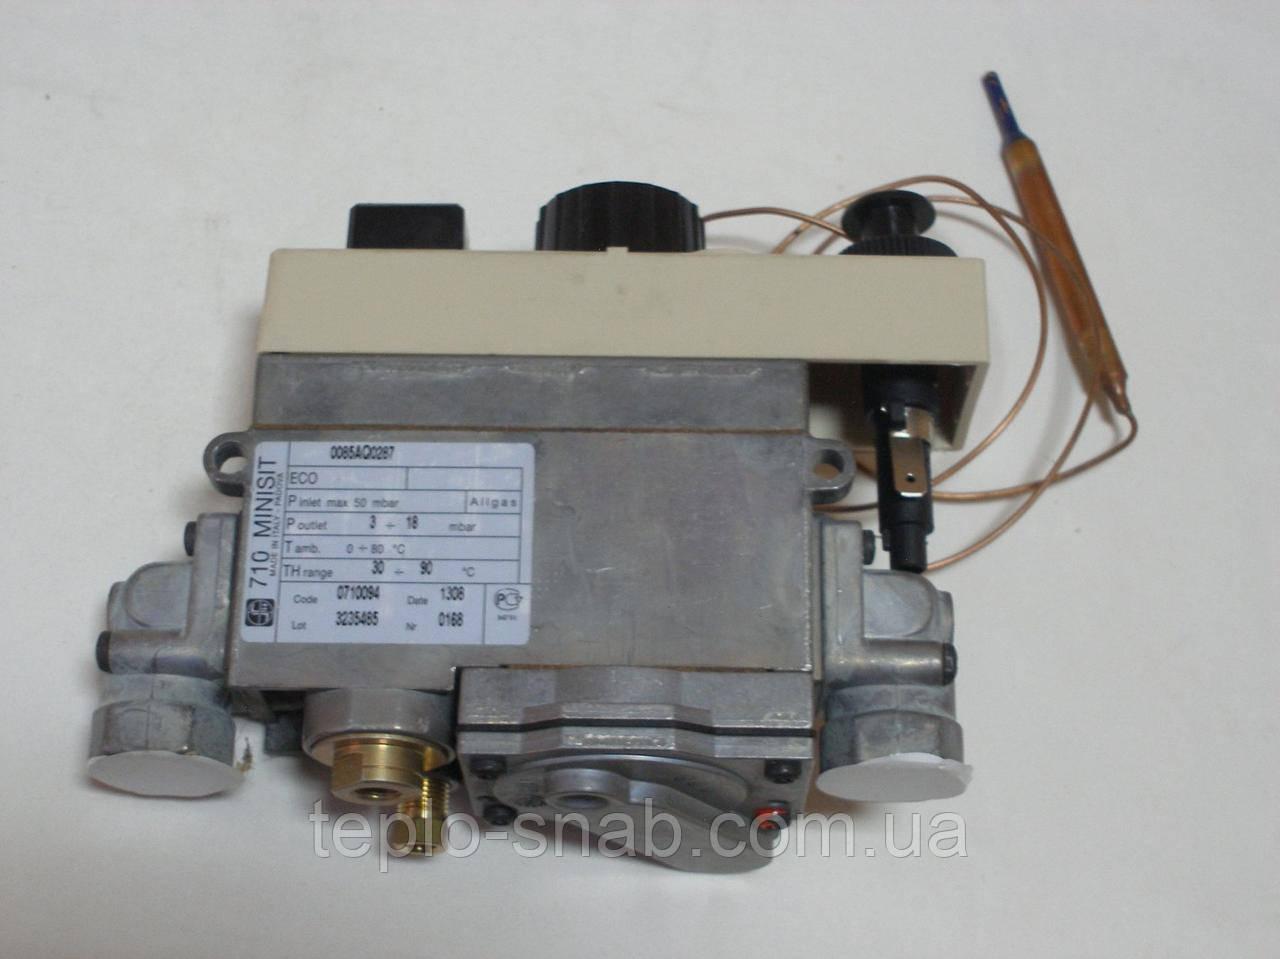 Газовий клапан 710 MINISIT енергонезалежний - . 0.710.094